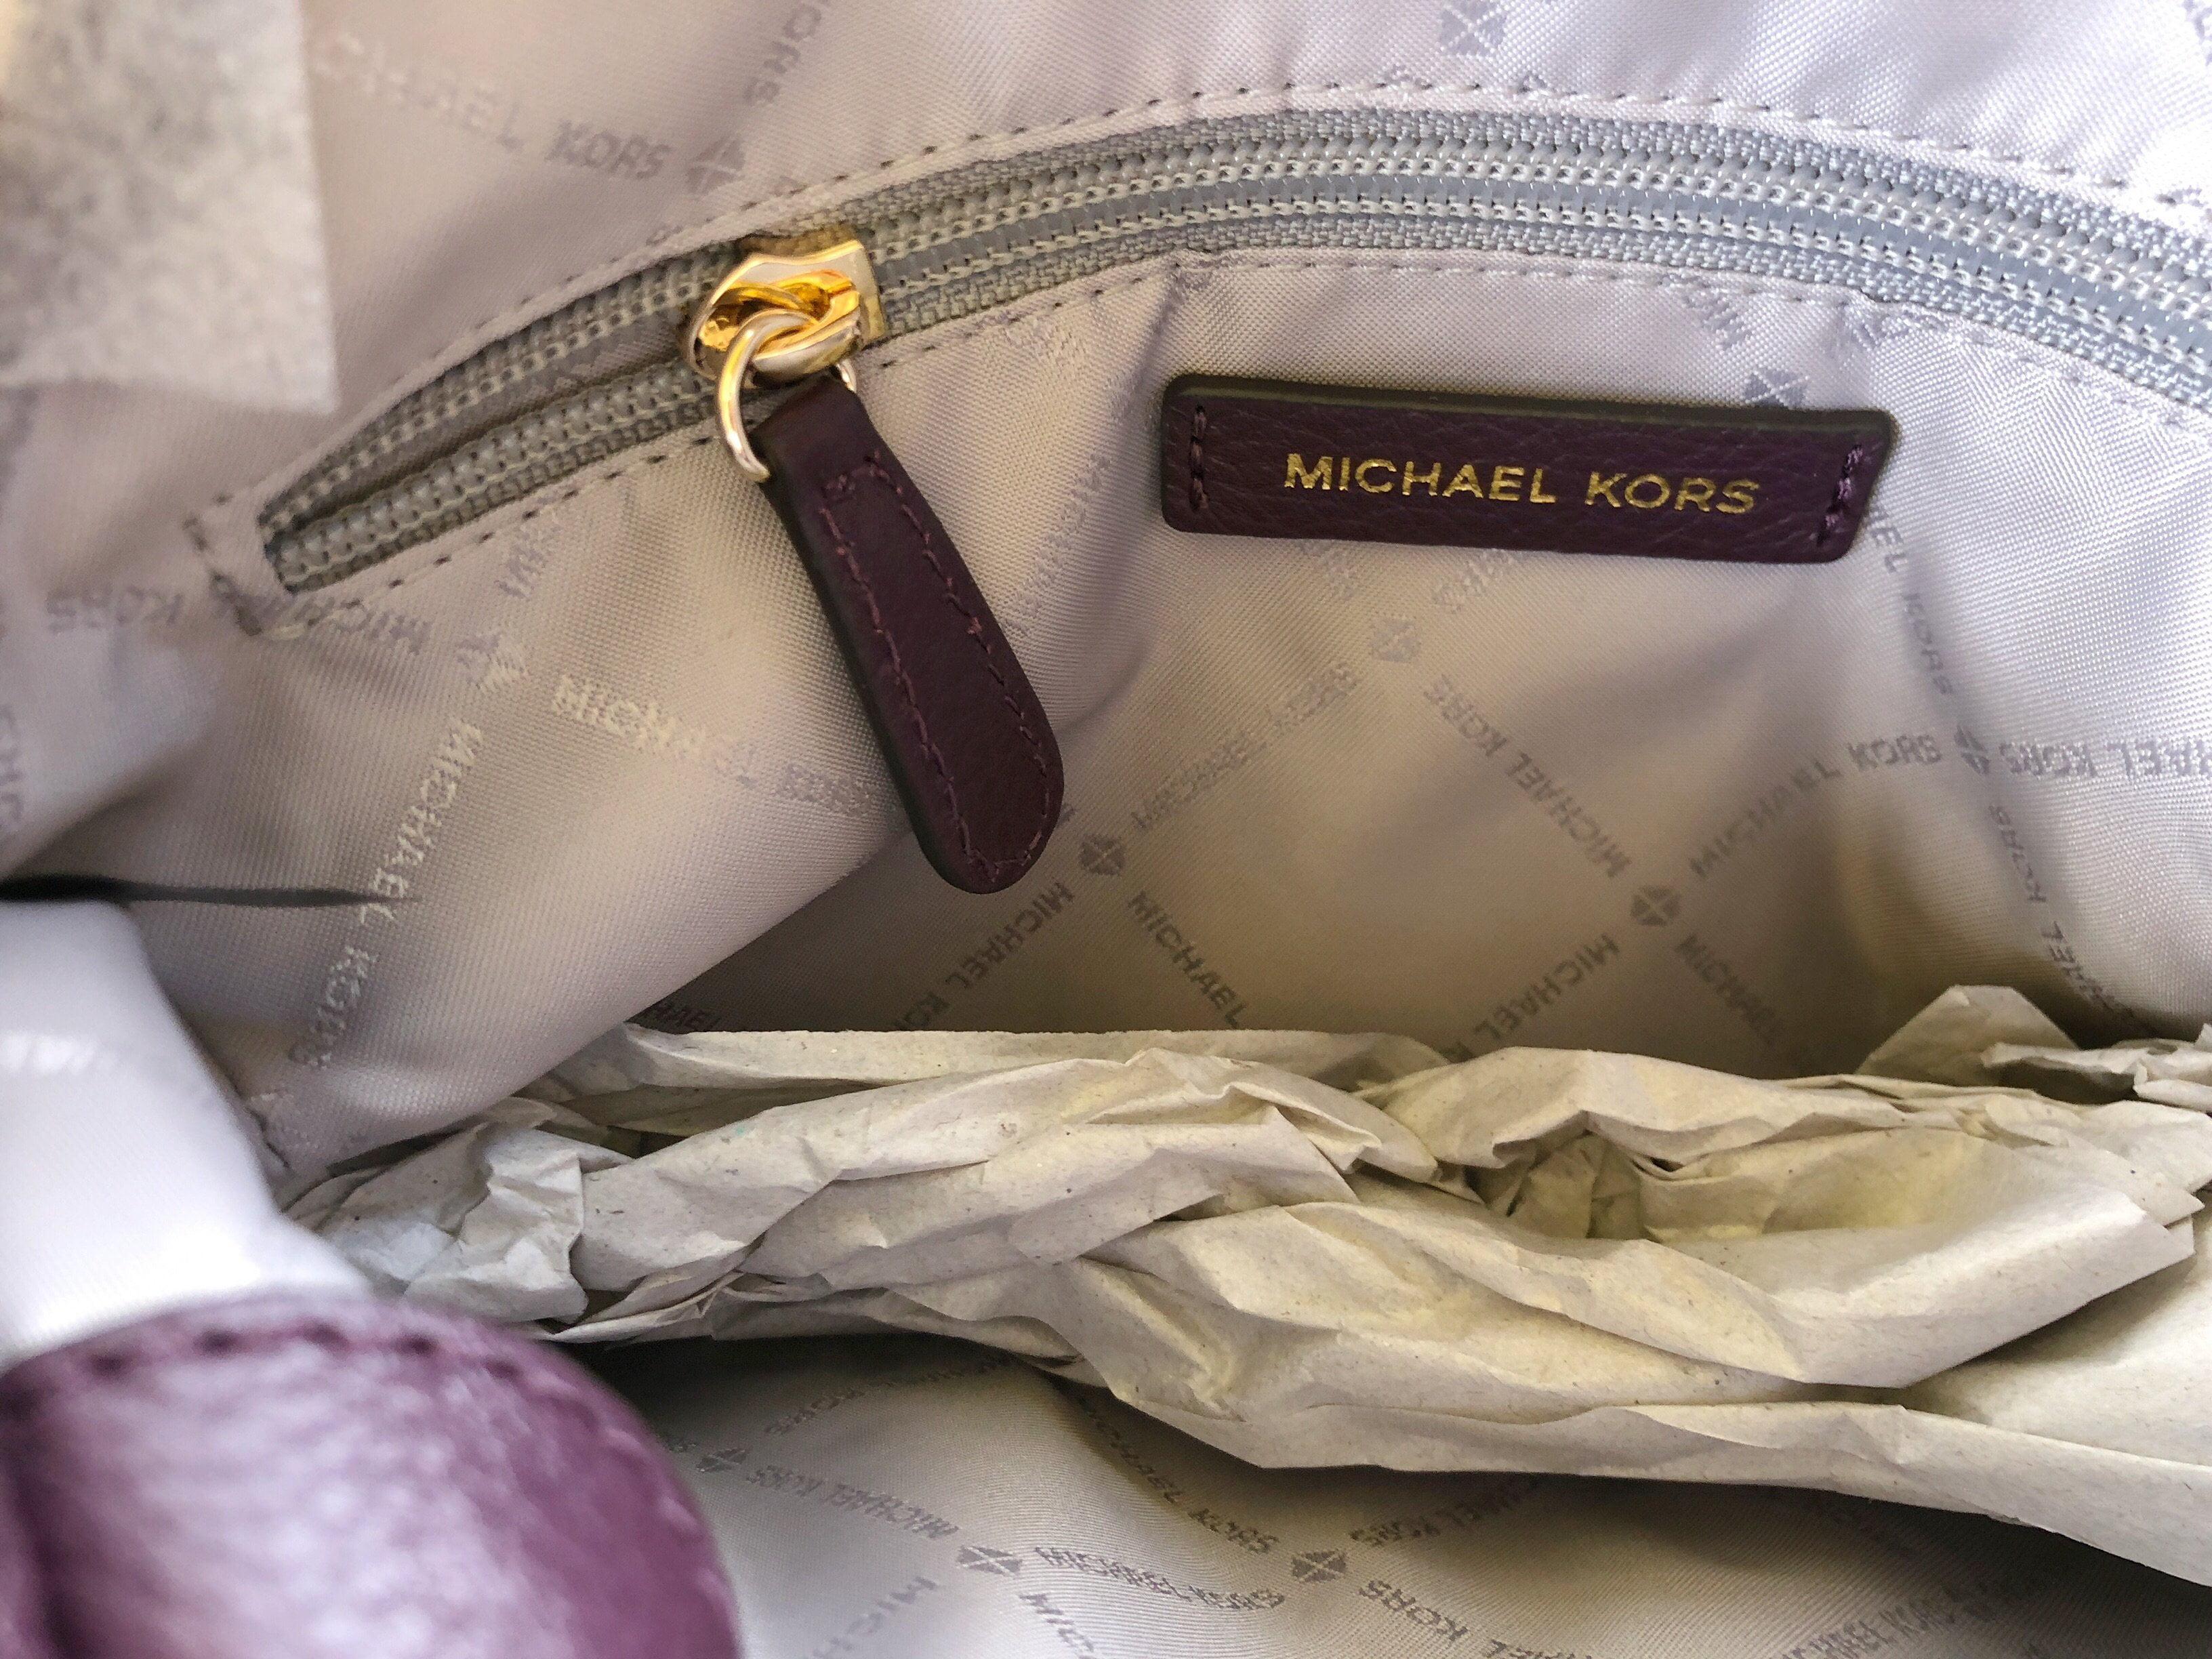 f068b6290b14 Michael Kors Jet Set Medium Messenger Shoulder Bag Chain Tote Damson Purple  - Walmart.com